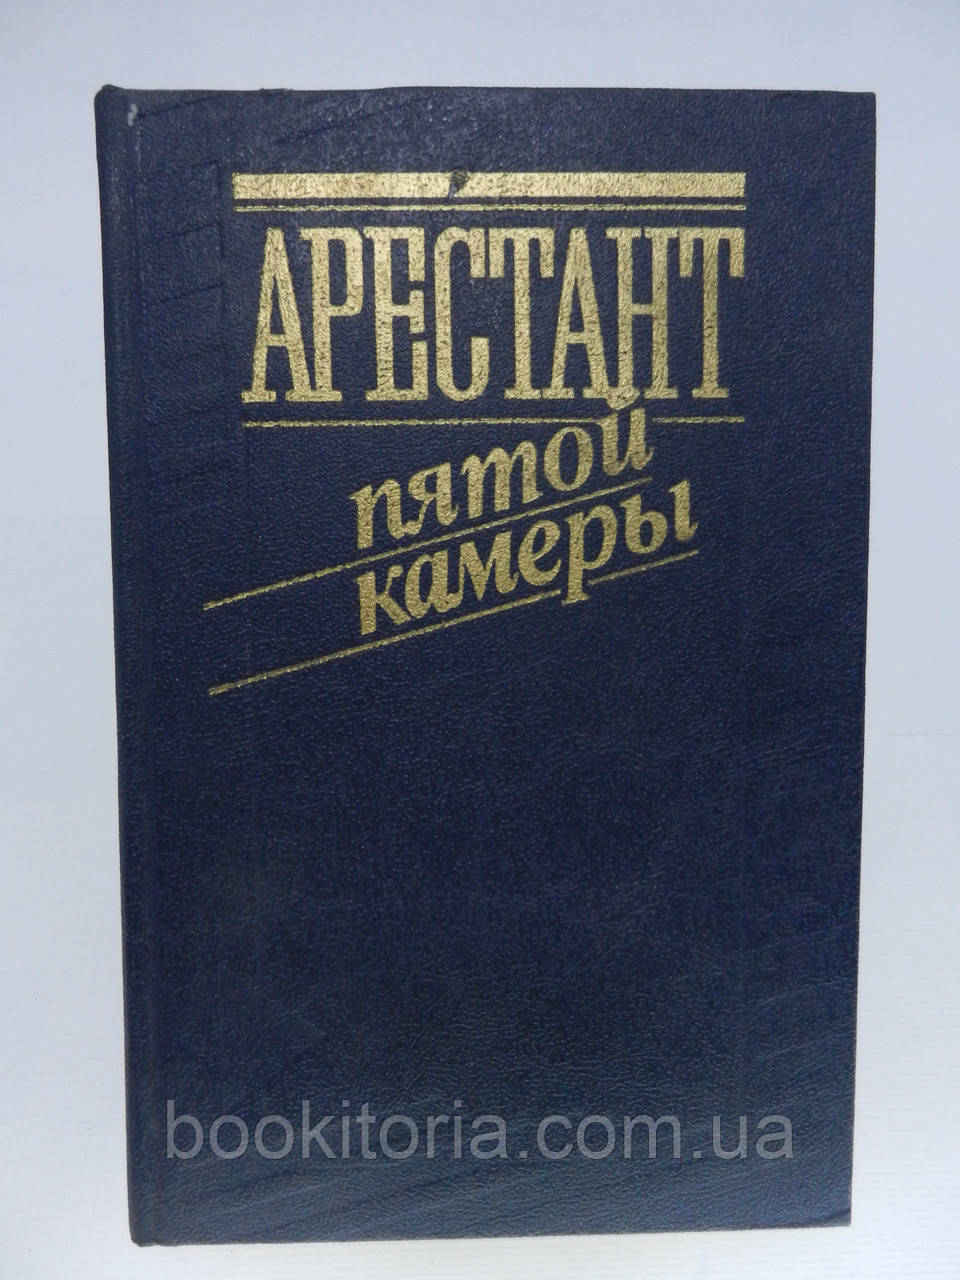 Кларов Ю. Арестант пятой камеры (б/у)., фото 1